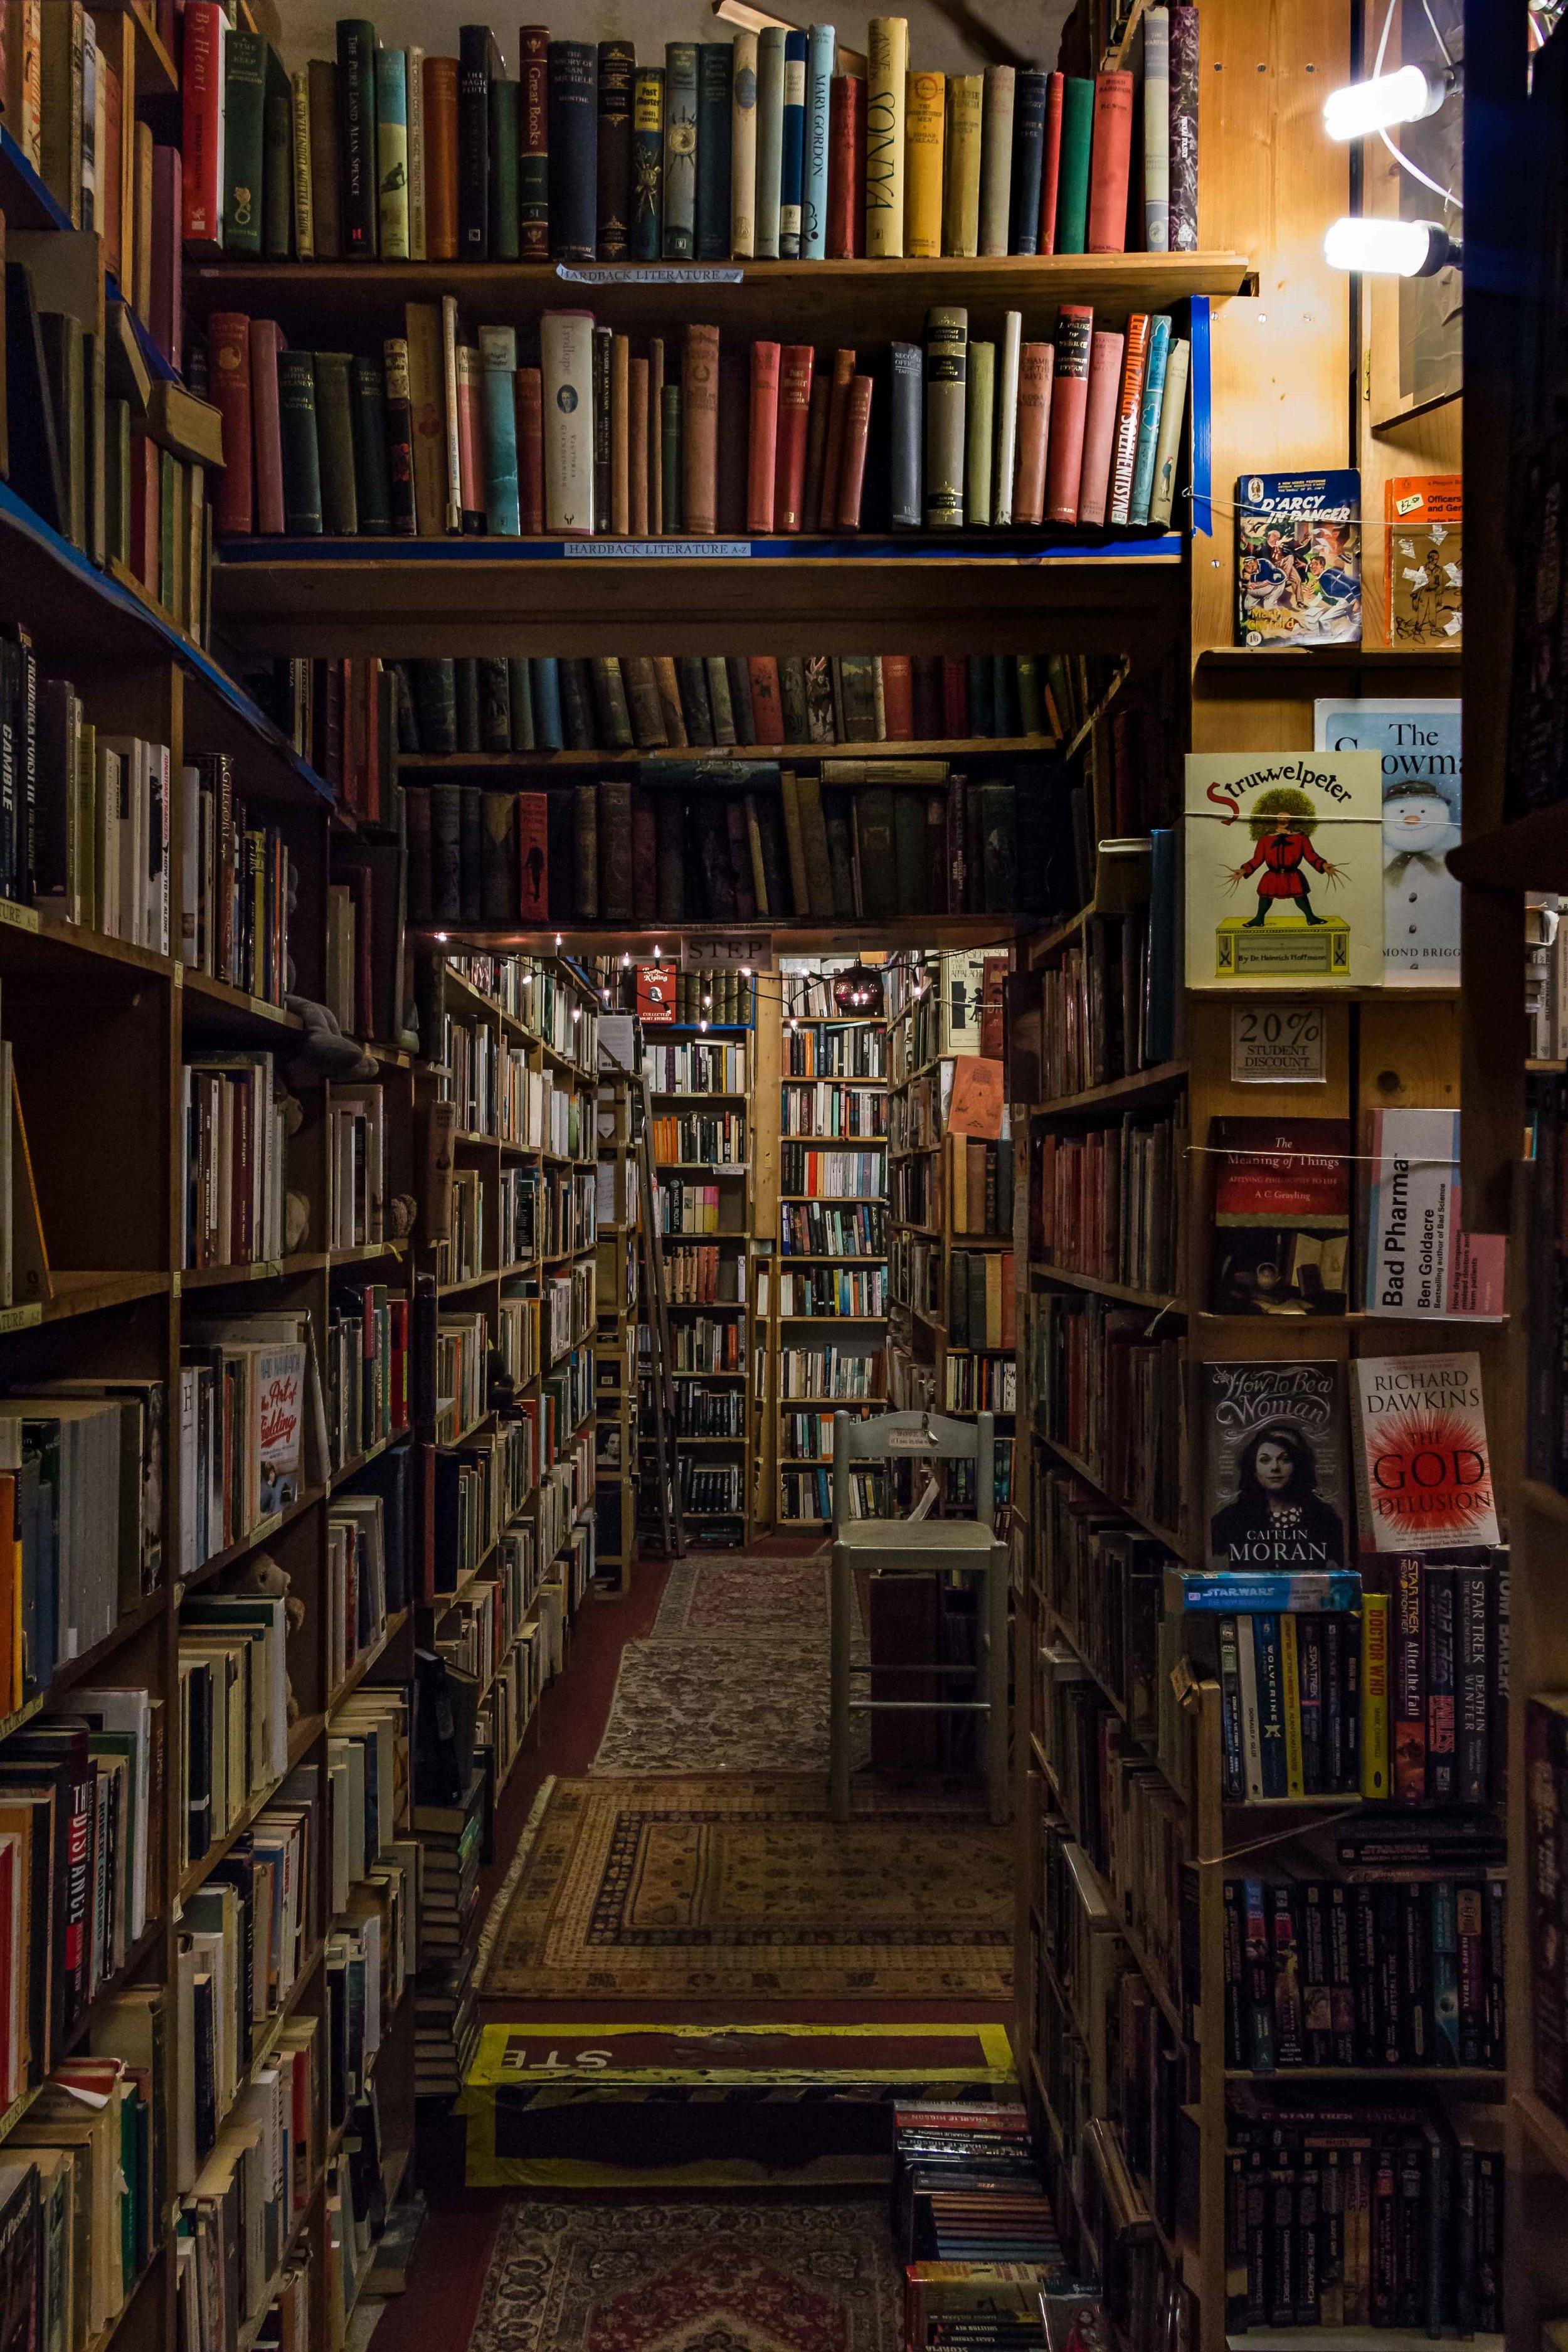 SOA_Edinburgh-Scotland-armchair-books.jpg